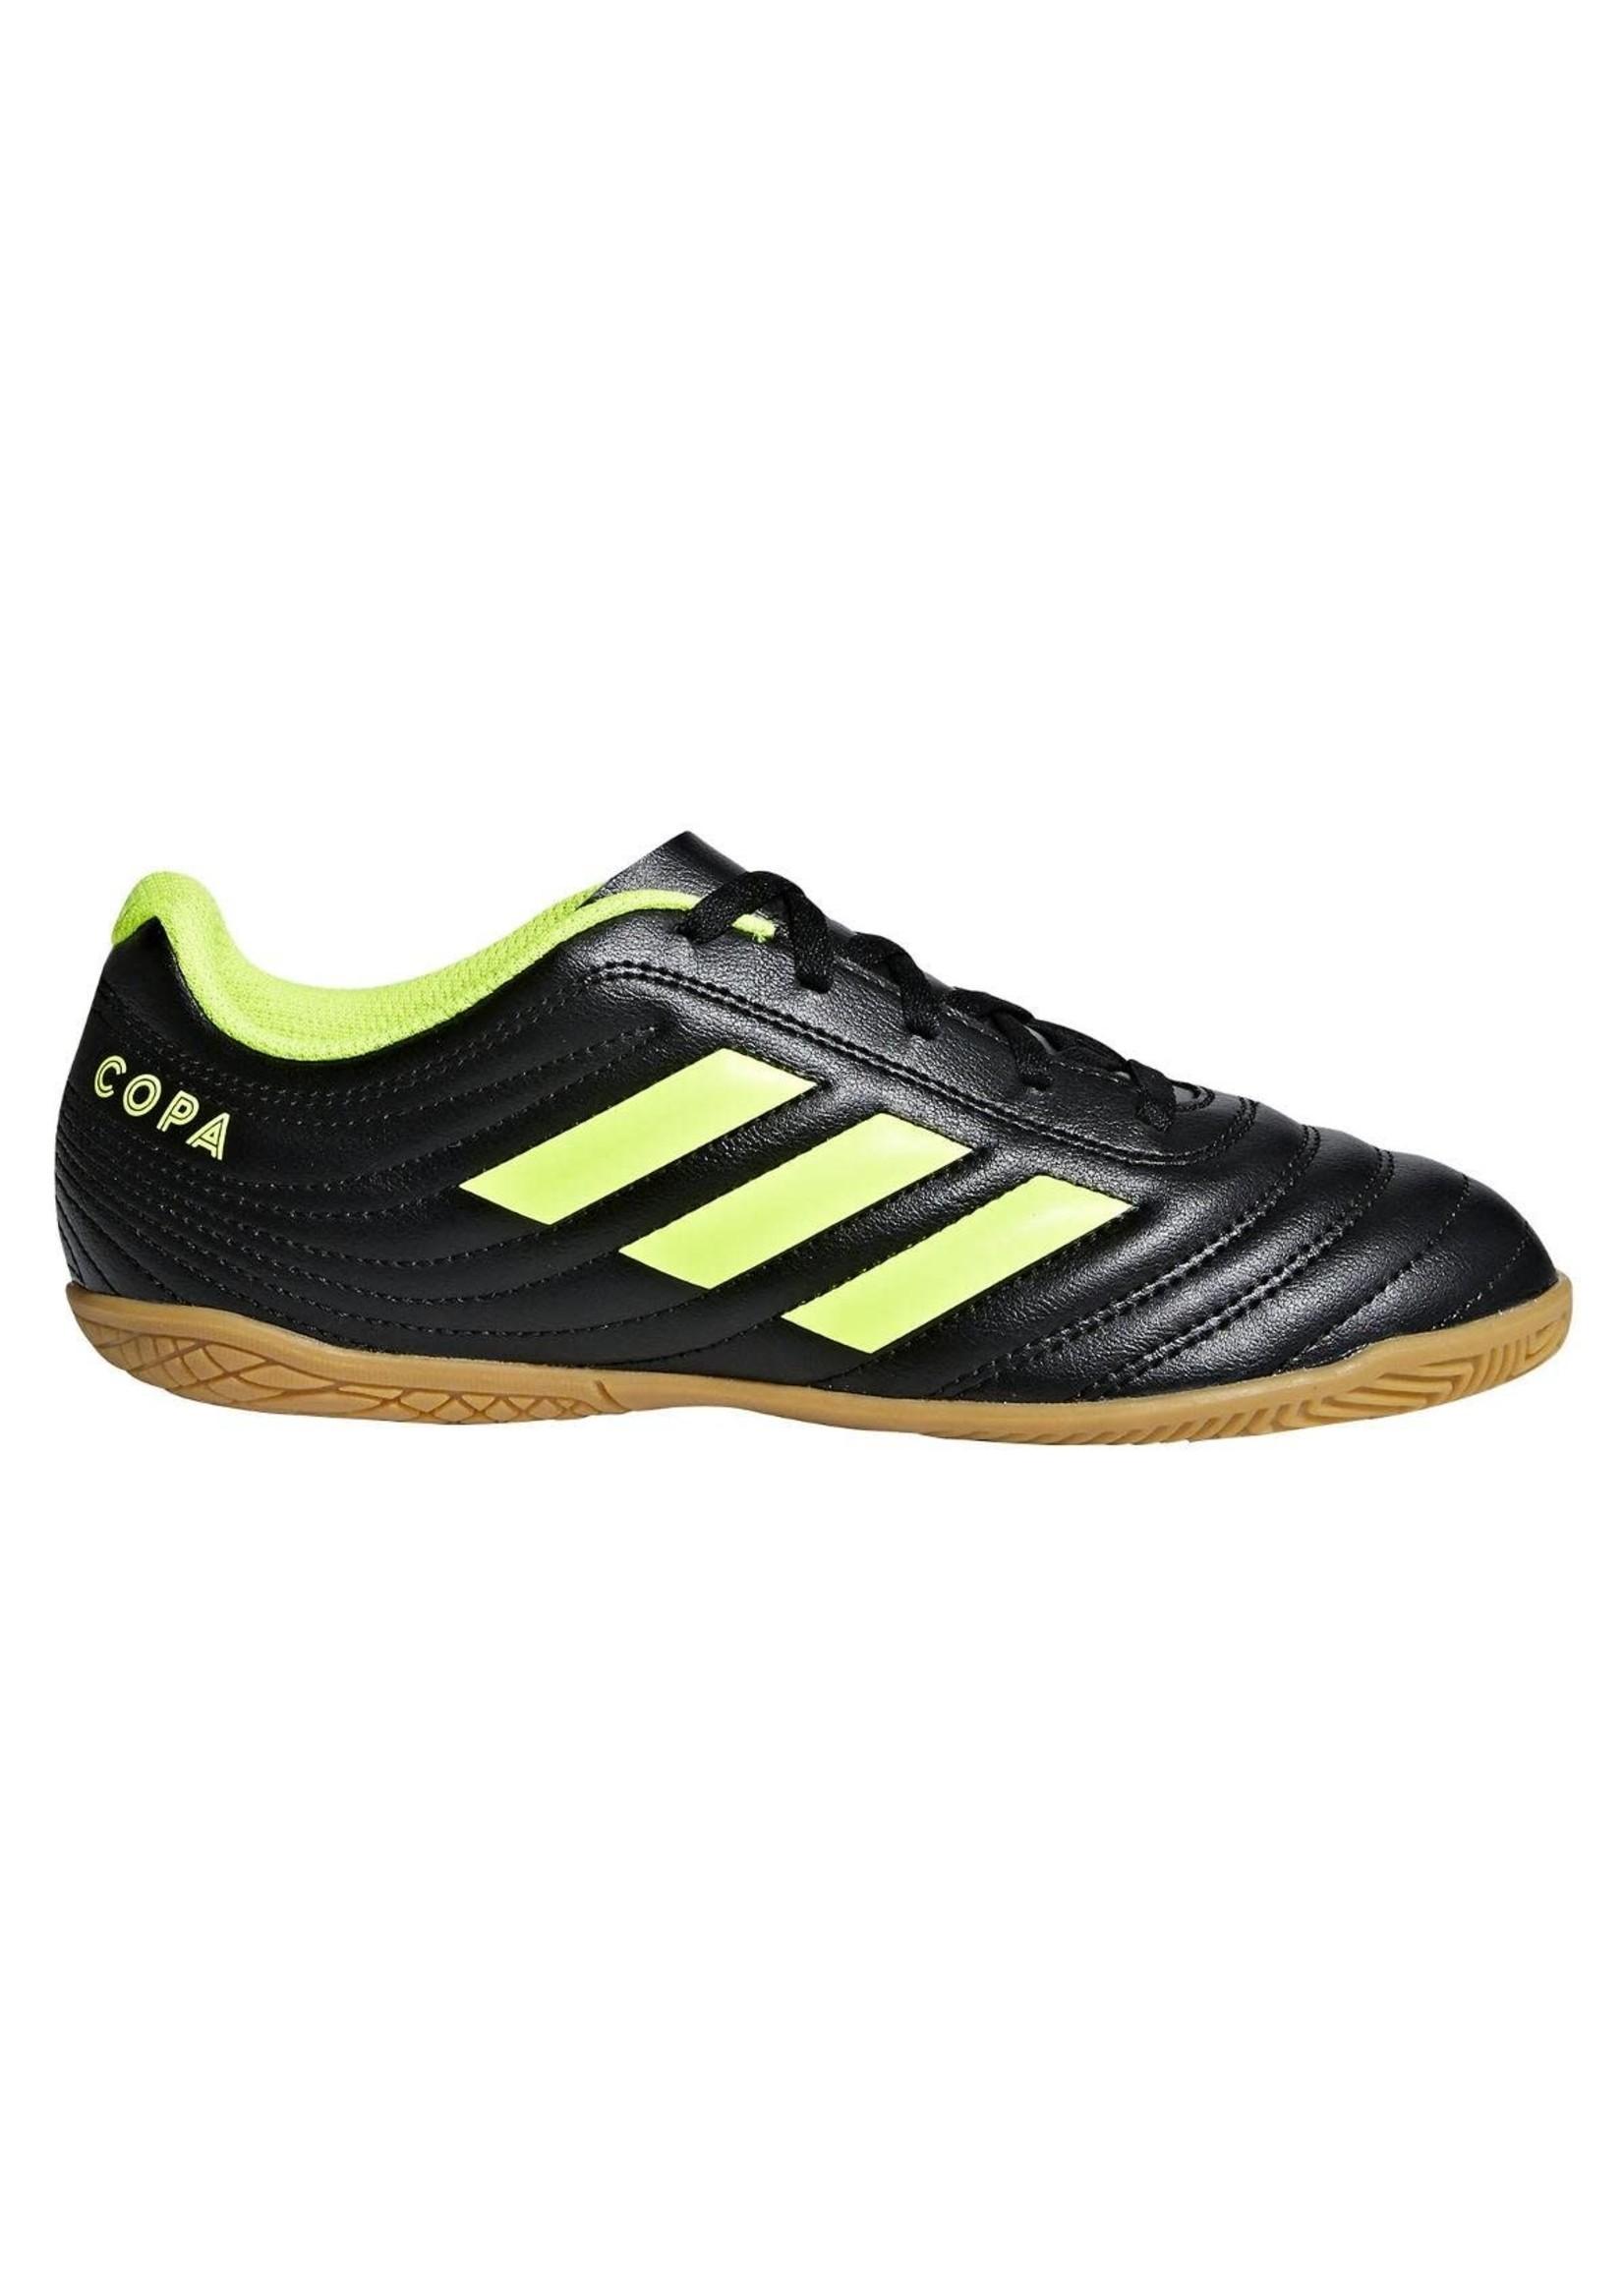 Adidas Copa 19.4 IN Jr D98095